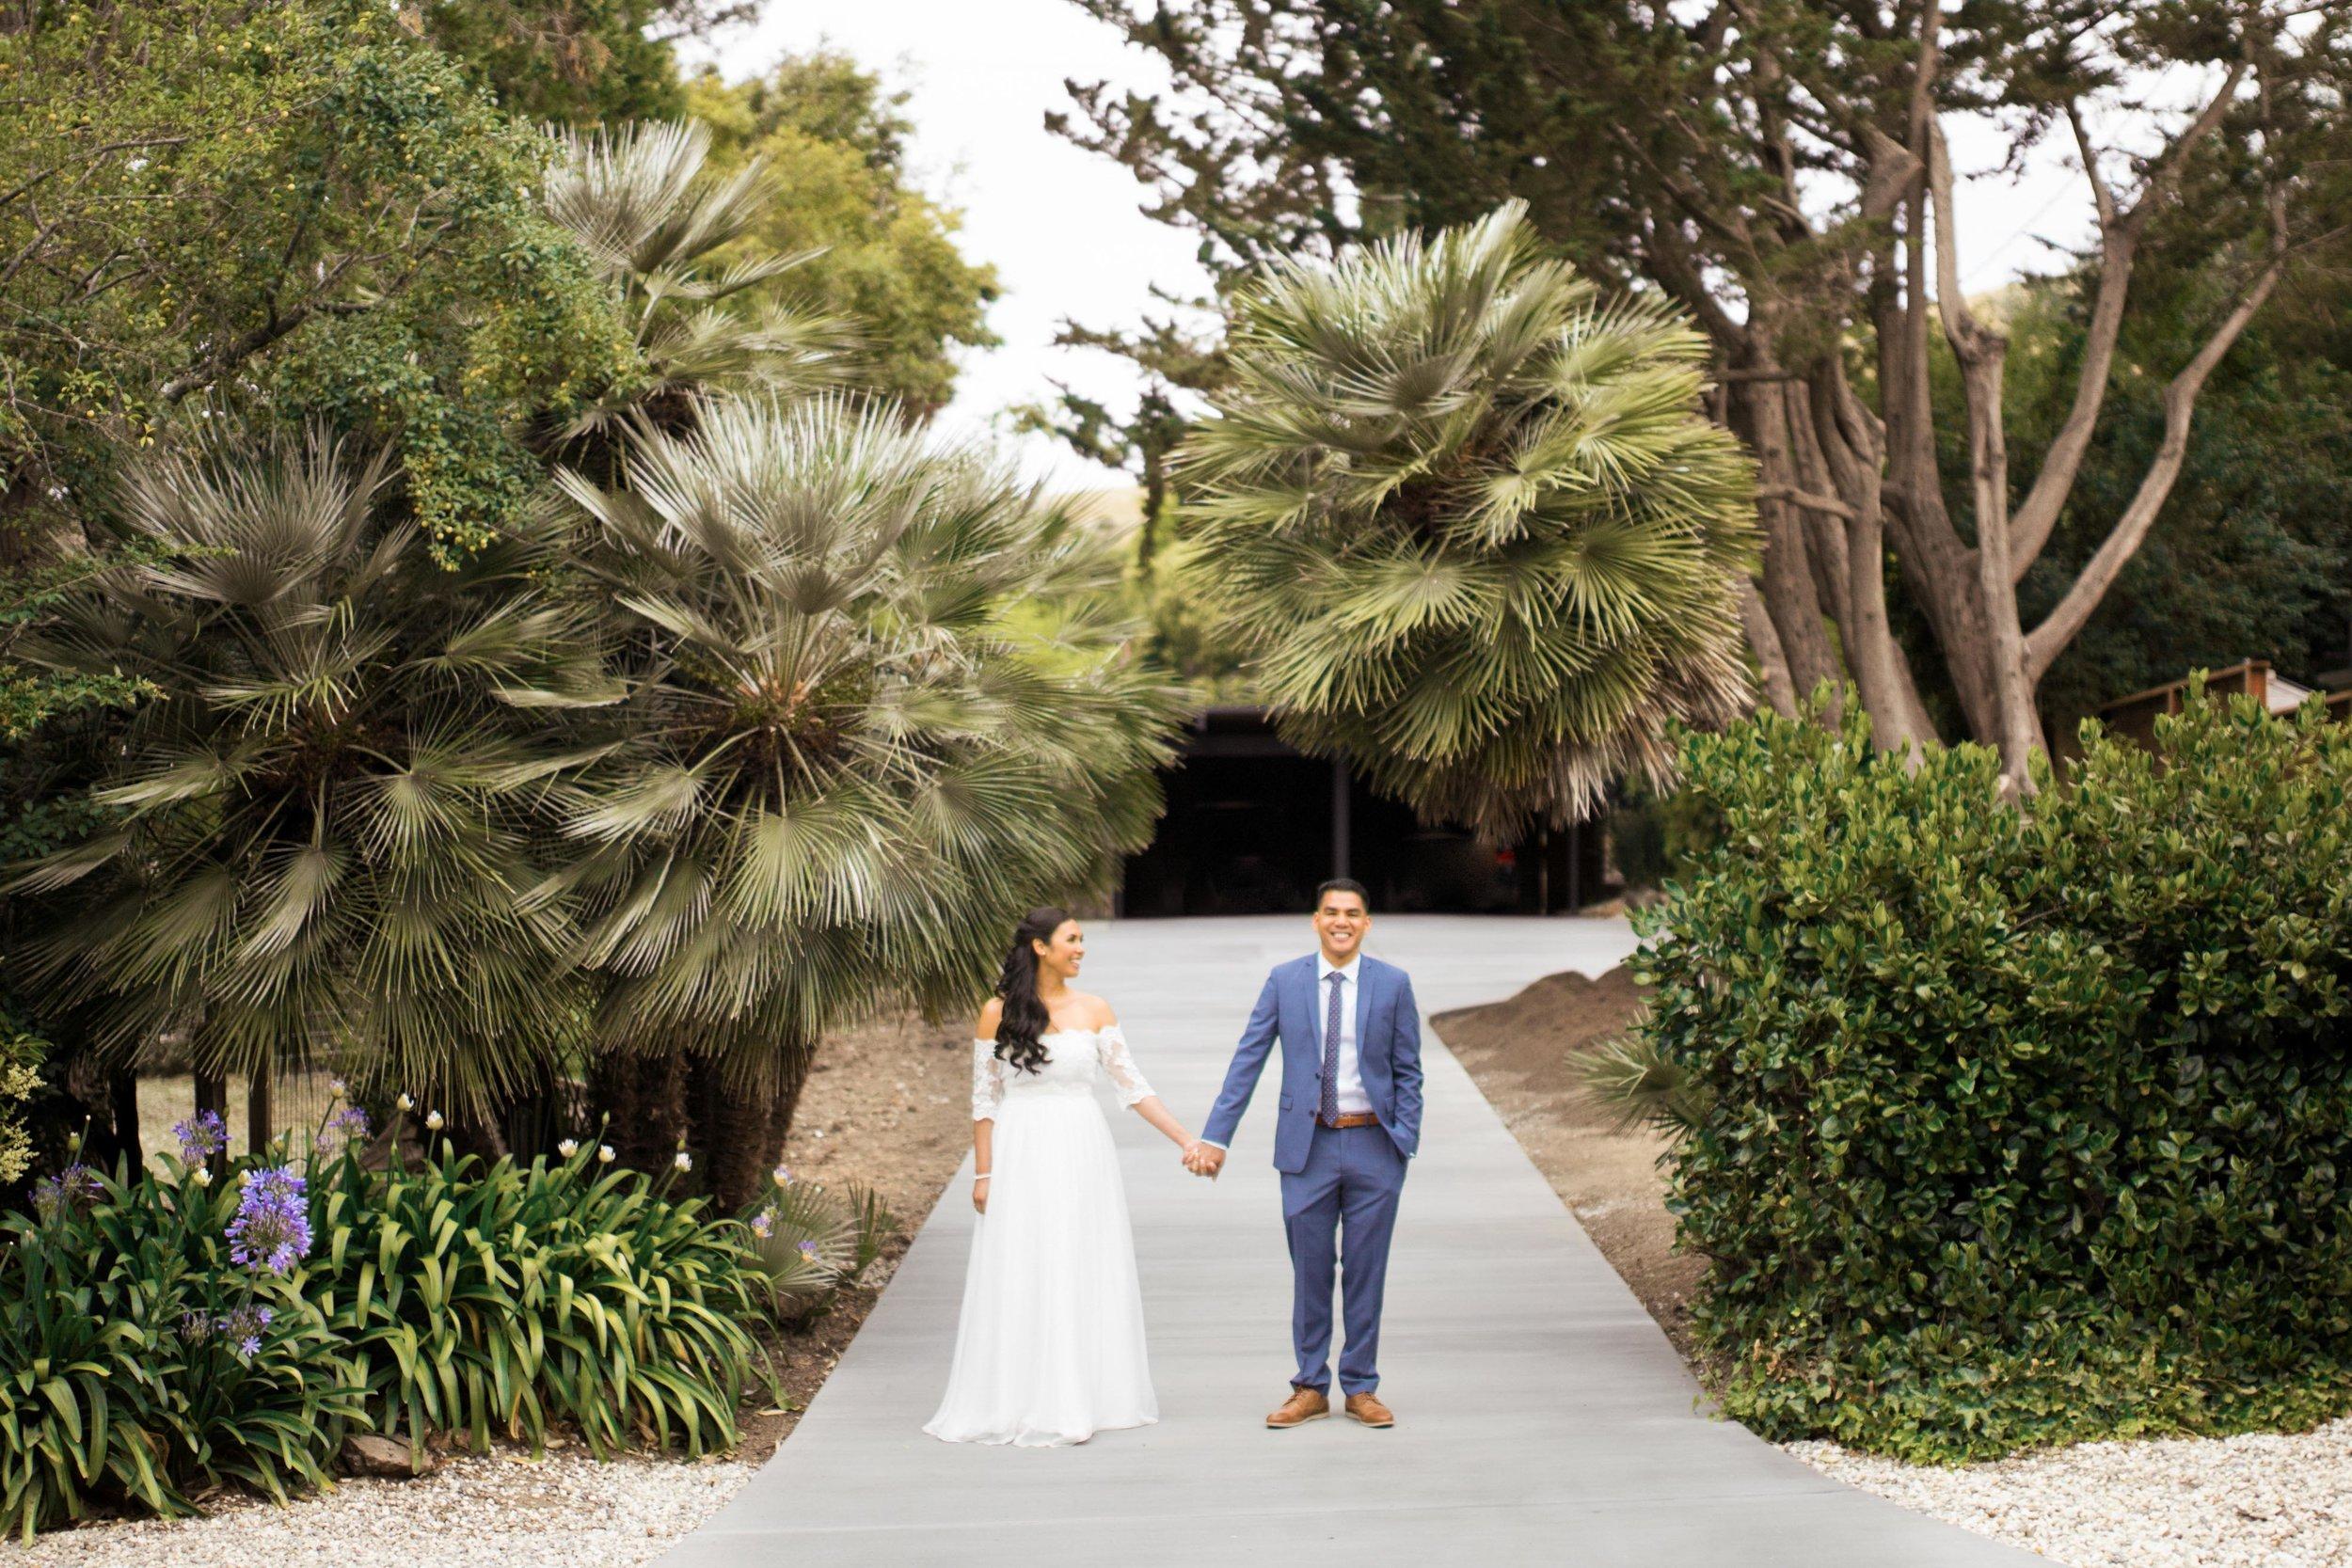 024_Krysten-Crebin-Bay-Area-Elopement-Wedding-Photographer-Videographer.jpg